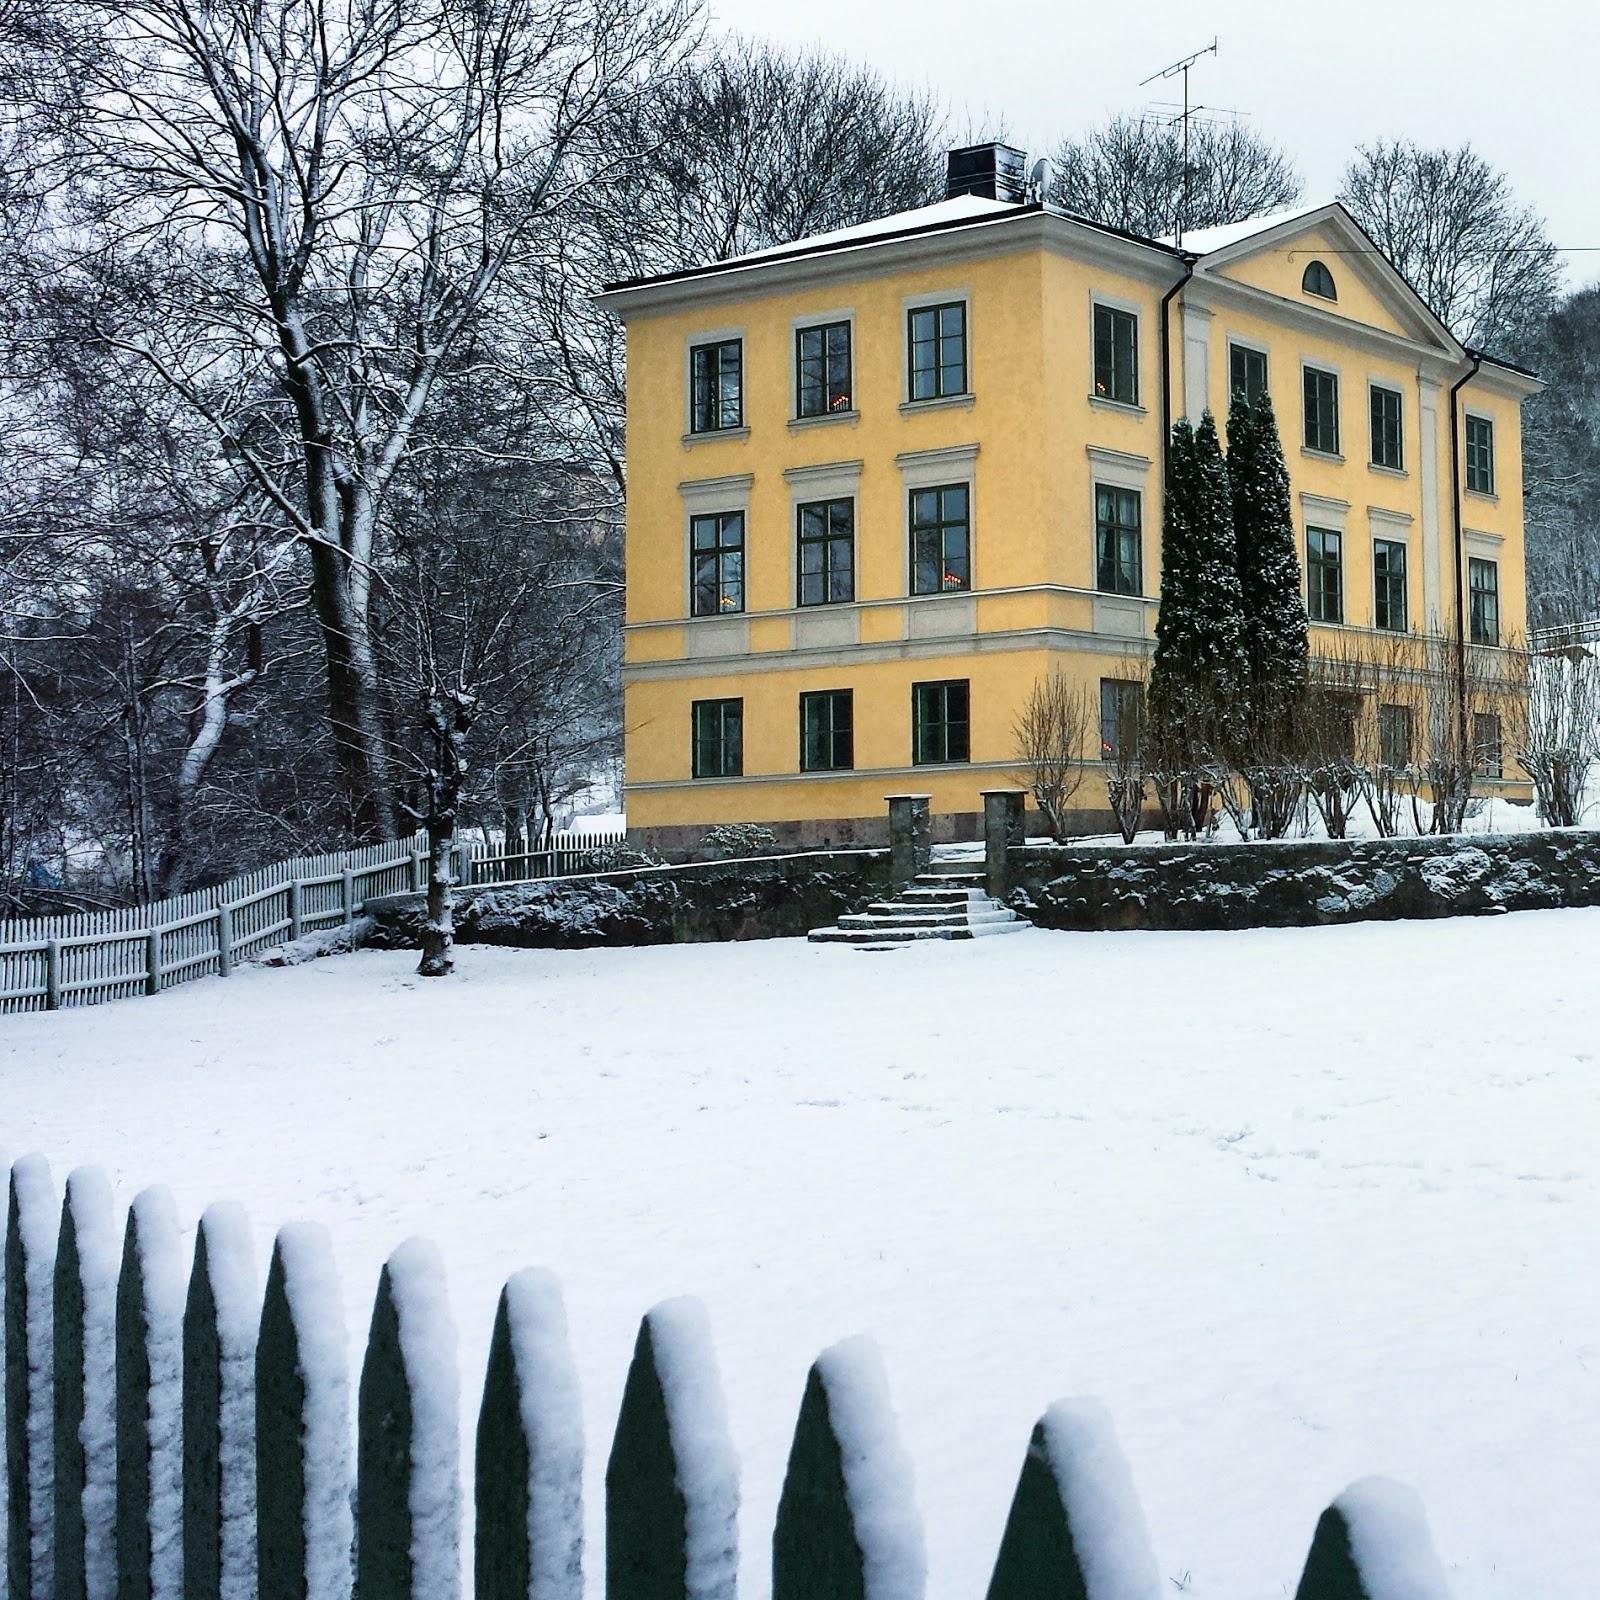 Karlbergssjön, Kungsholmen, Stockholm Sweden  |  A collection of memories on afeathery*nest  |  http://afeatherynest.com